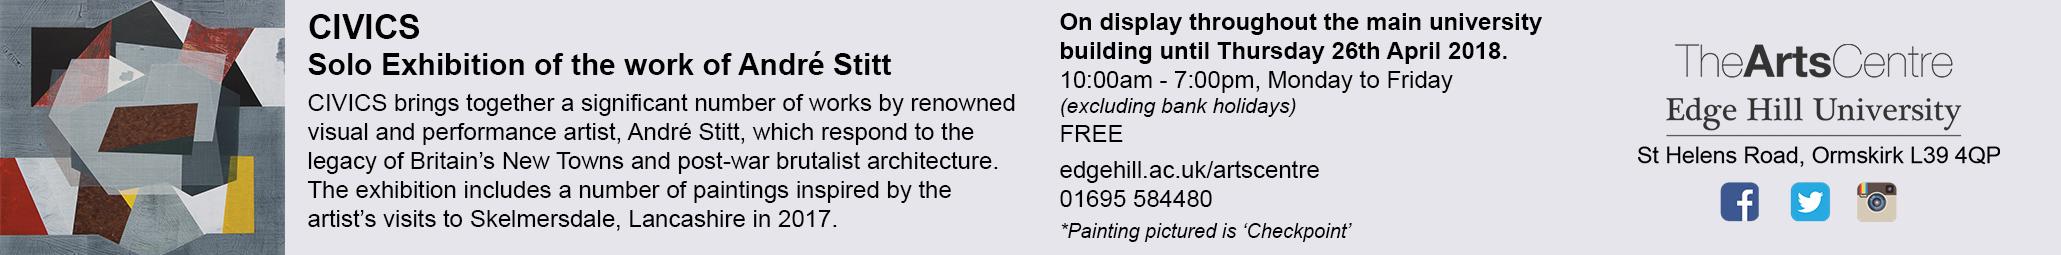 Broken image, click for CIVICs at Arts Centre, Edge Hill University